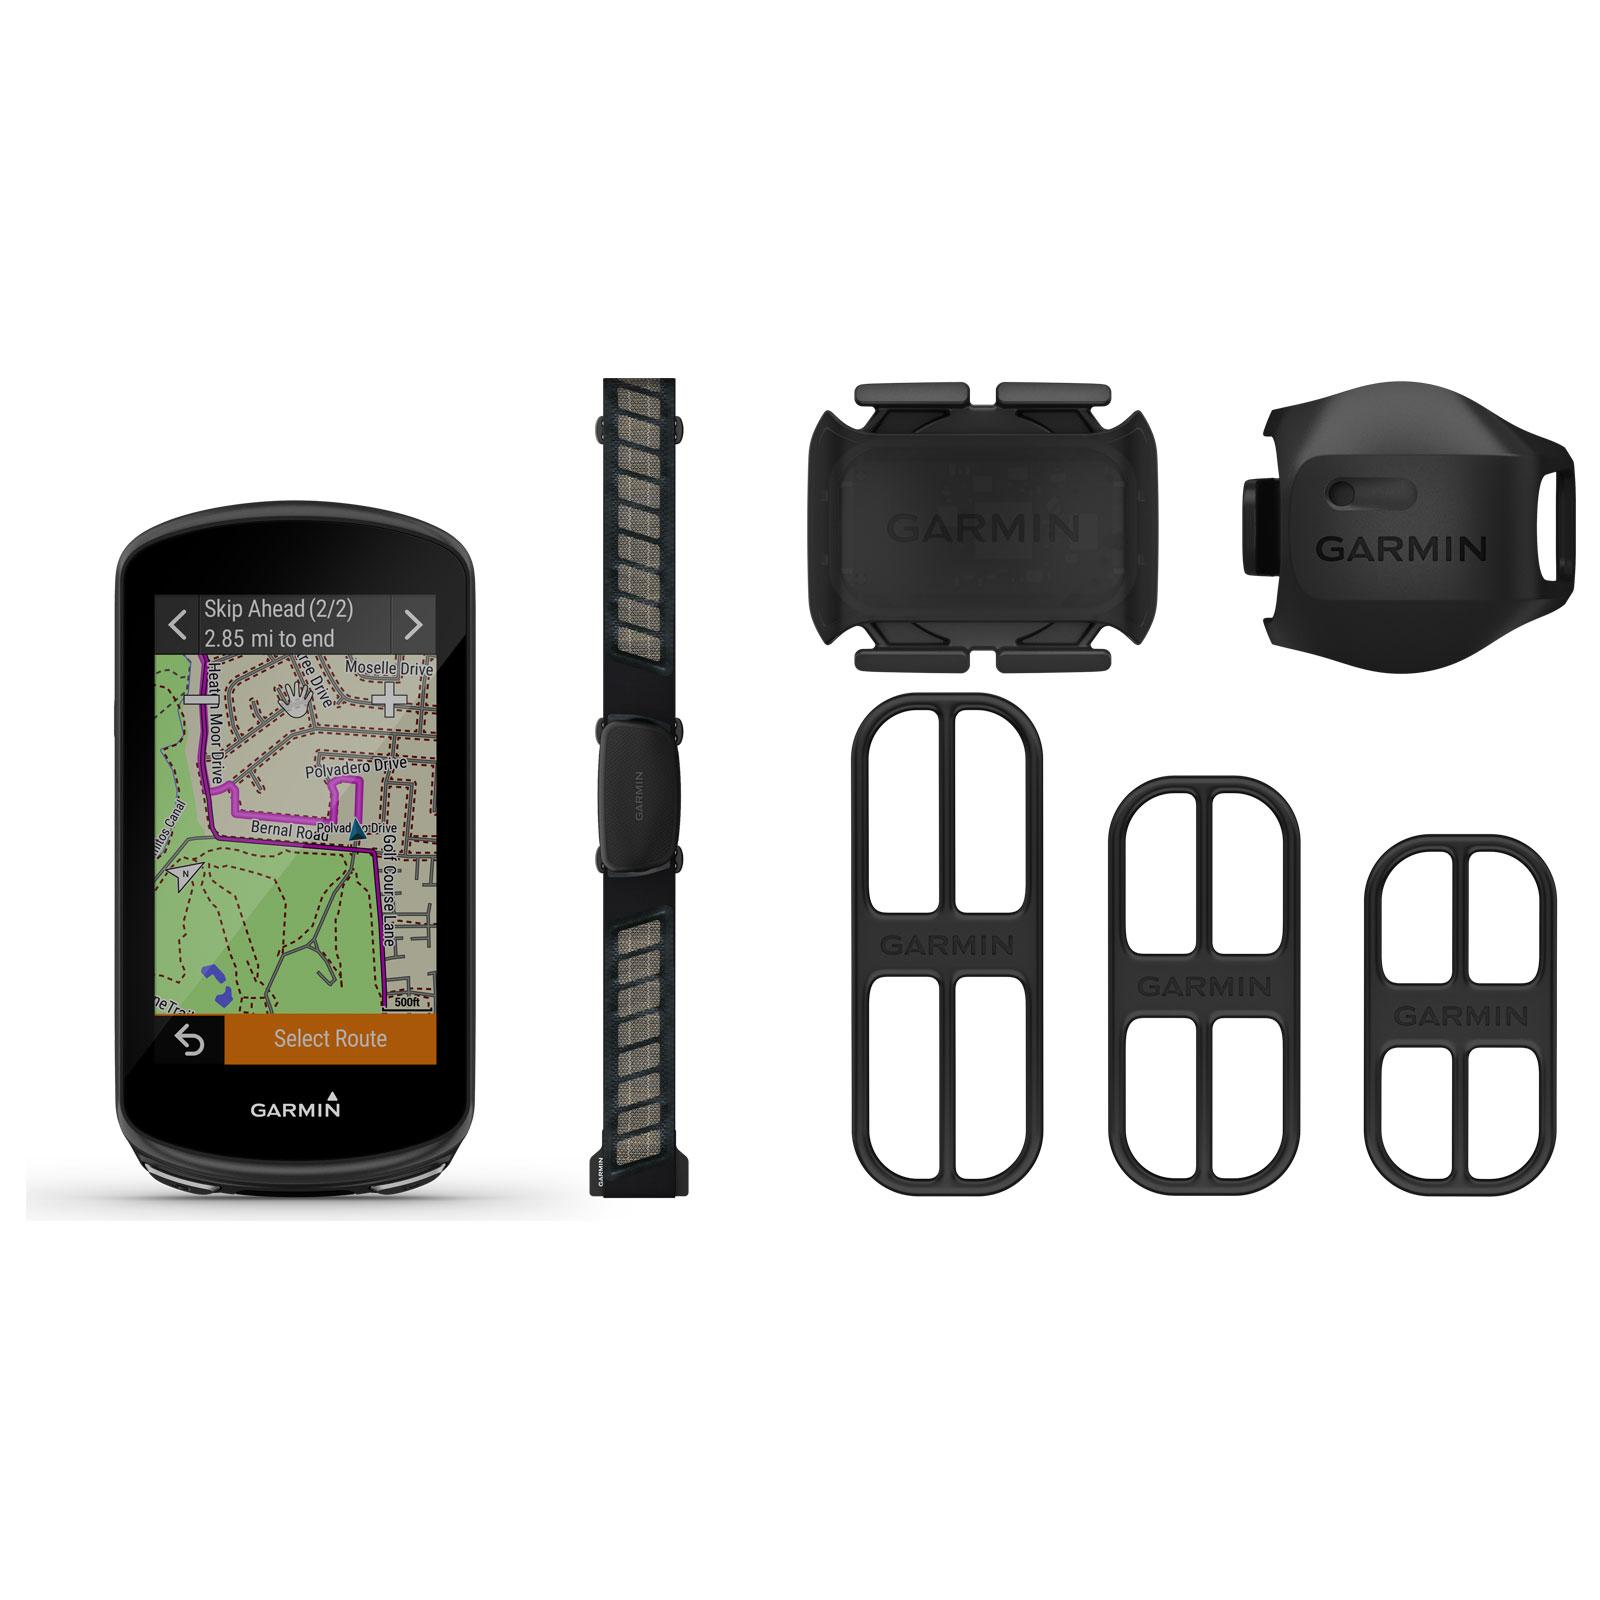 Garmin Edge 1030 Plus Bundle GPS Cycling Computer + Heart Rate Monitor, Cadence / Speed Sensor